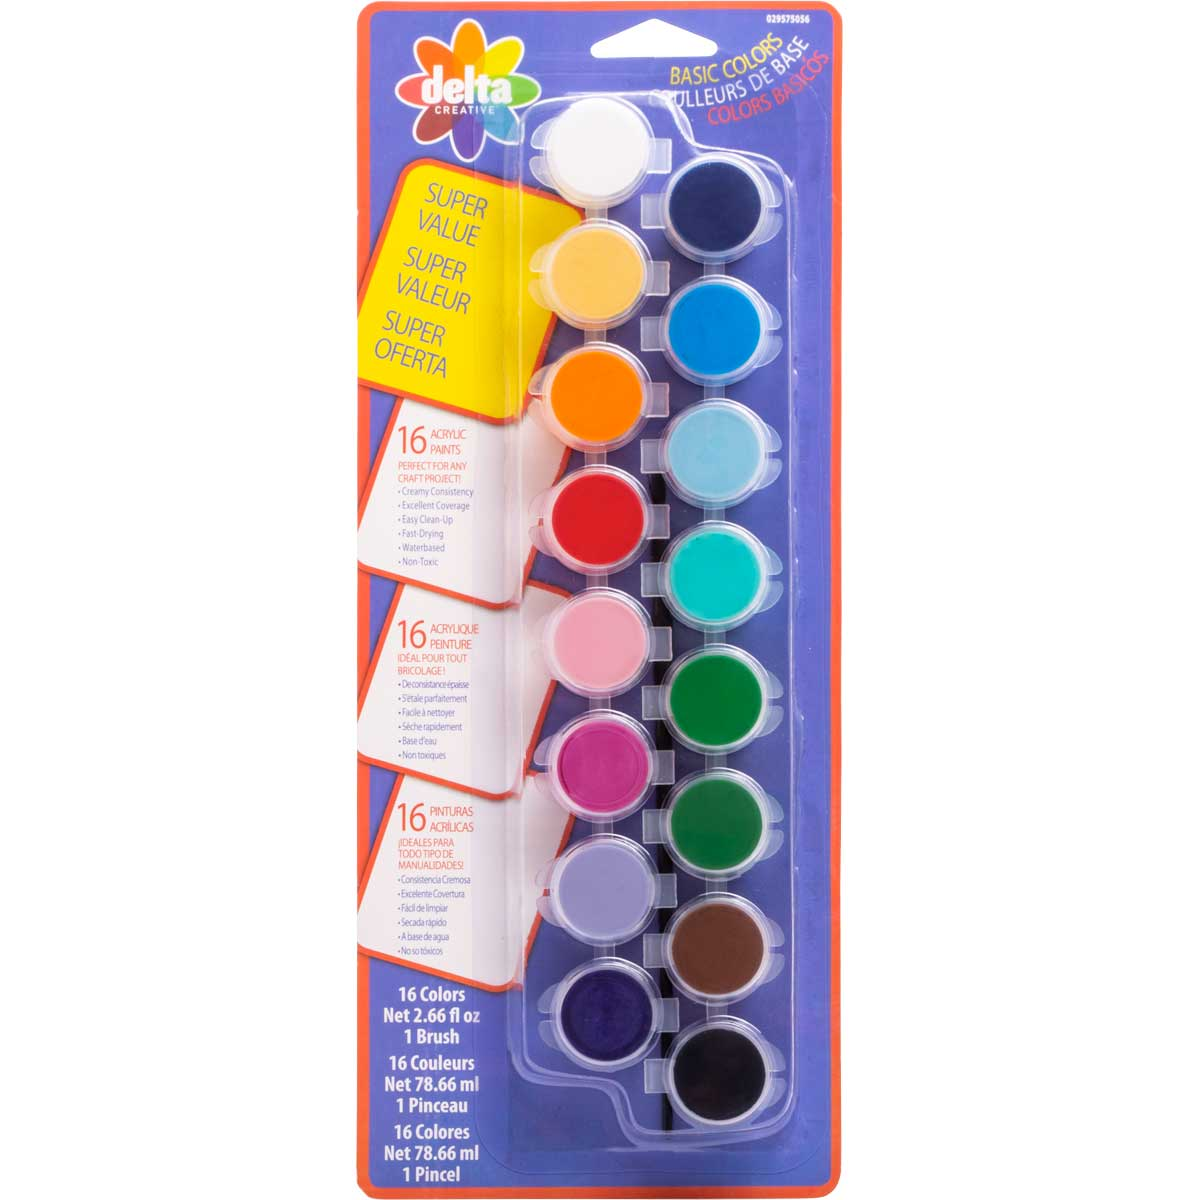 Delta Ceramcoat ® Paint Super Value Set - Basic, 16 Colors - 029575056